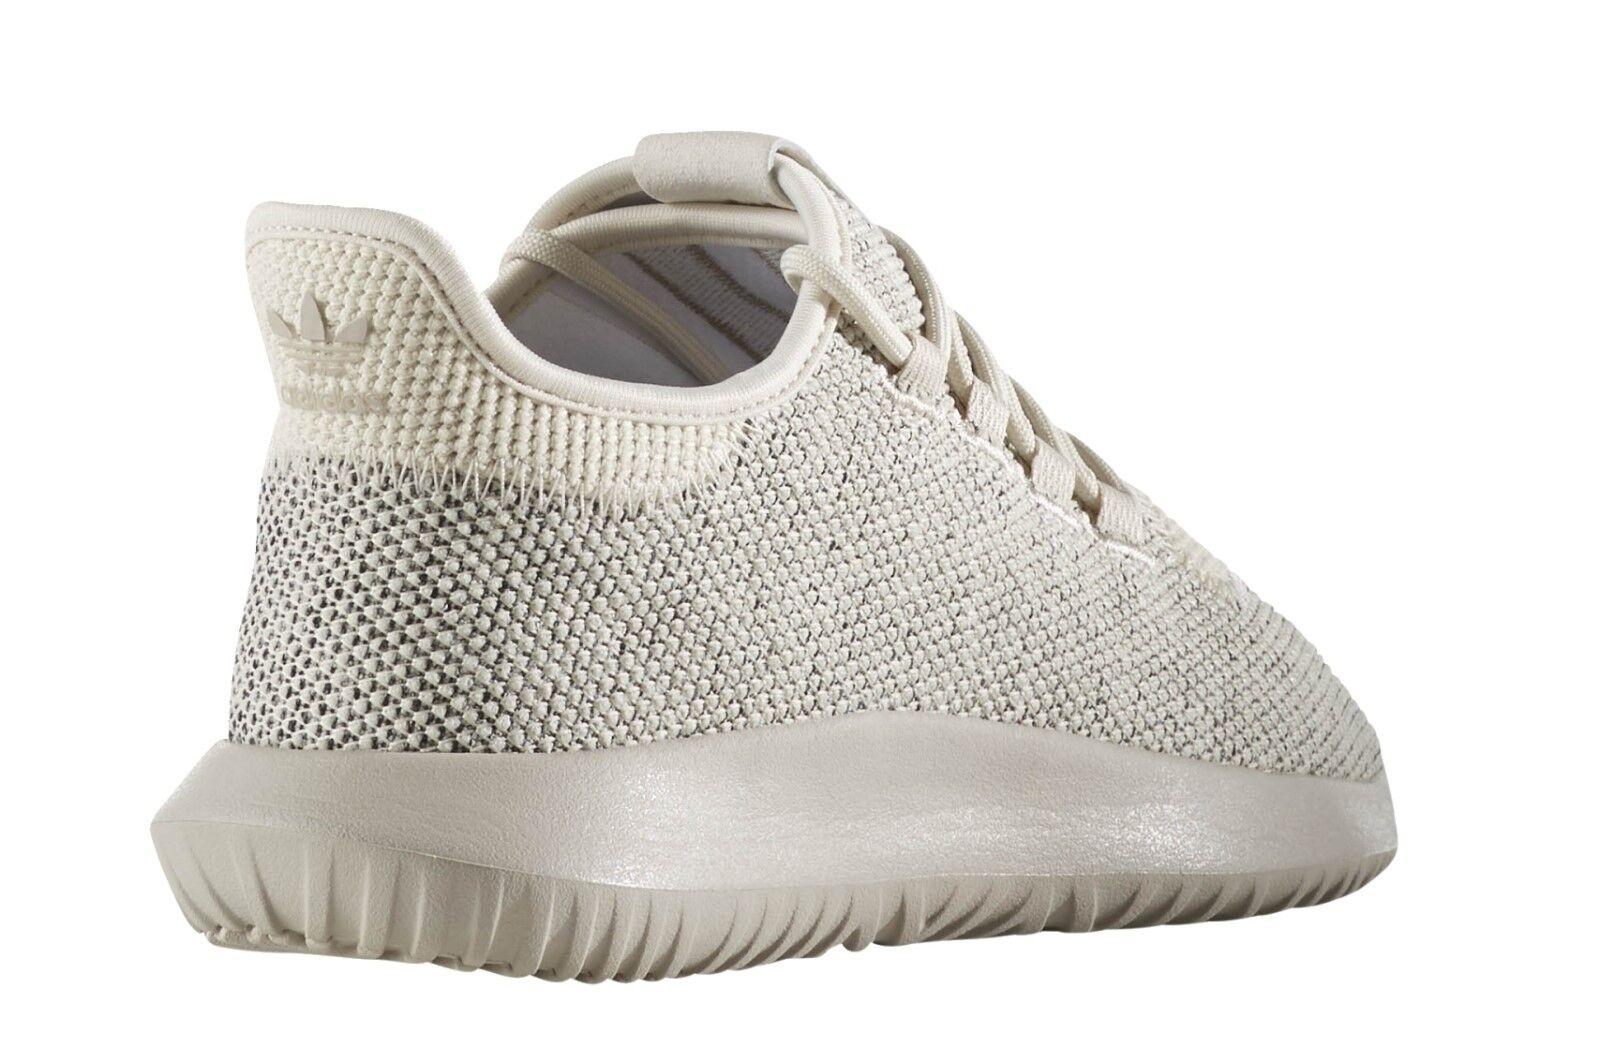 adidas Originals Schuhe BB8877 TUBULAR SHADOW Turnschuhe Clear Braun Woll weiß